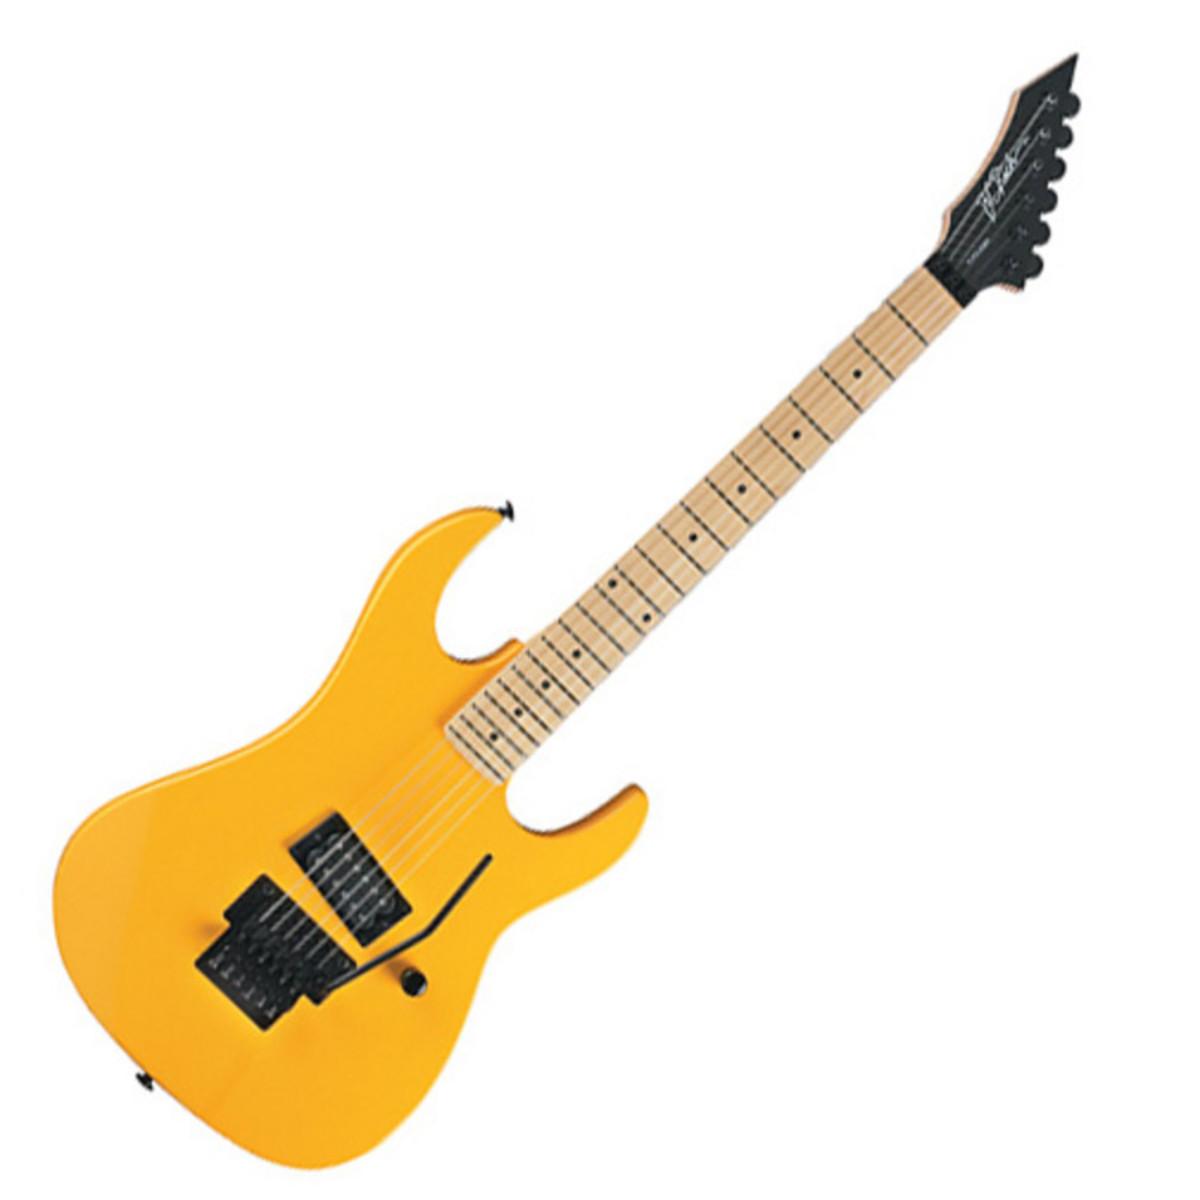 bc rich gunslinger guitare r tro jaune. Black Bedroom Furniture Sets. Home Design Ideas